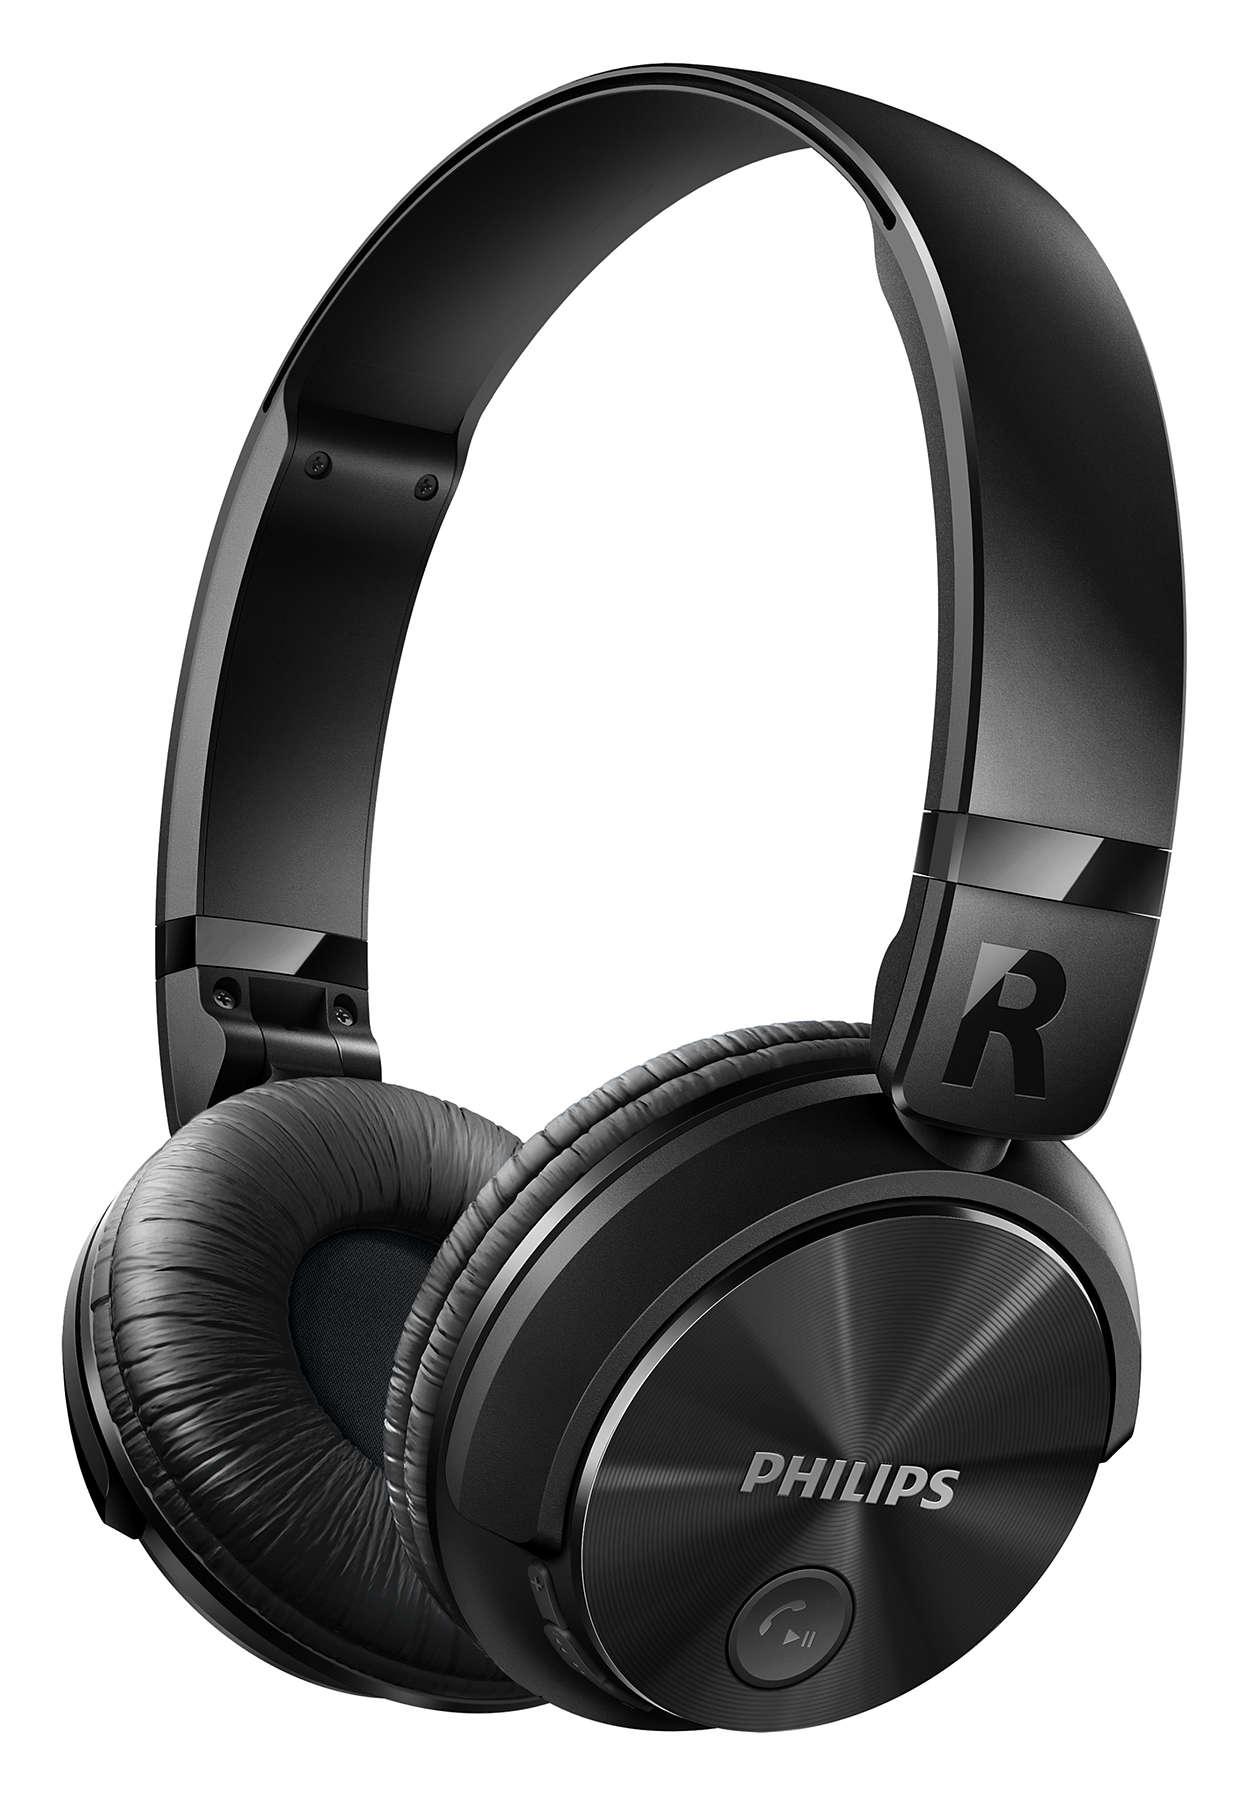 PHILIPS SHB3060BK ON-EAR BLUETOOTH HEADSET (BLACK)